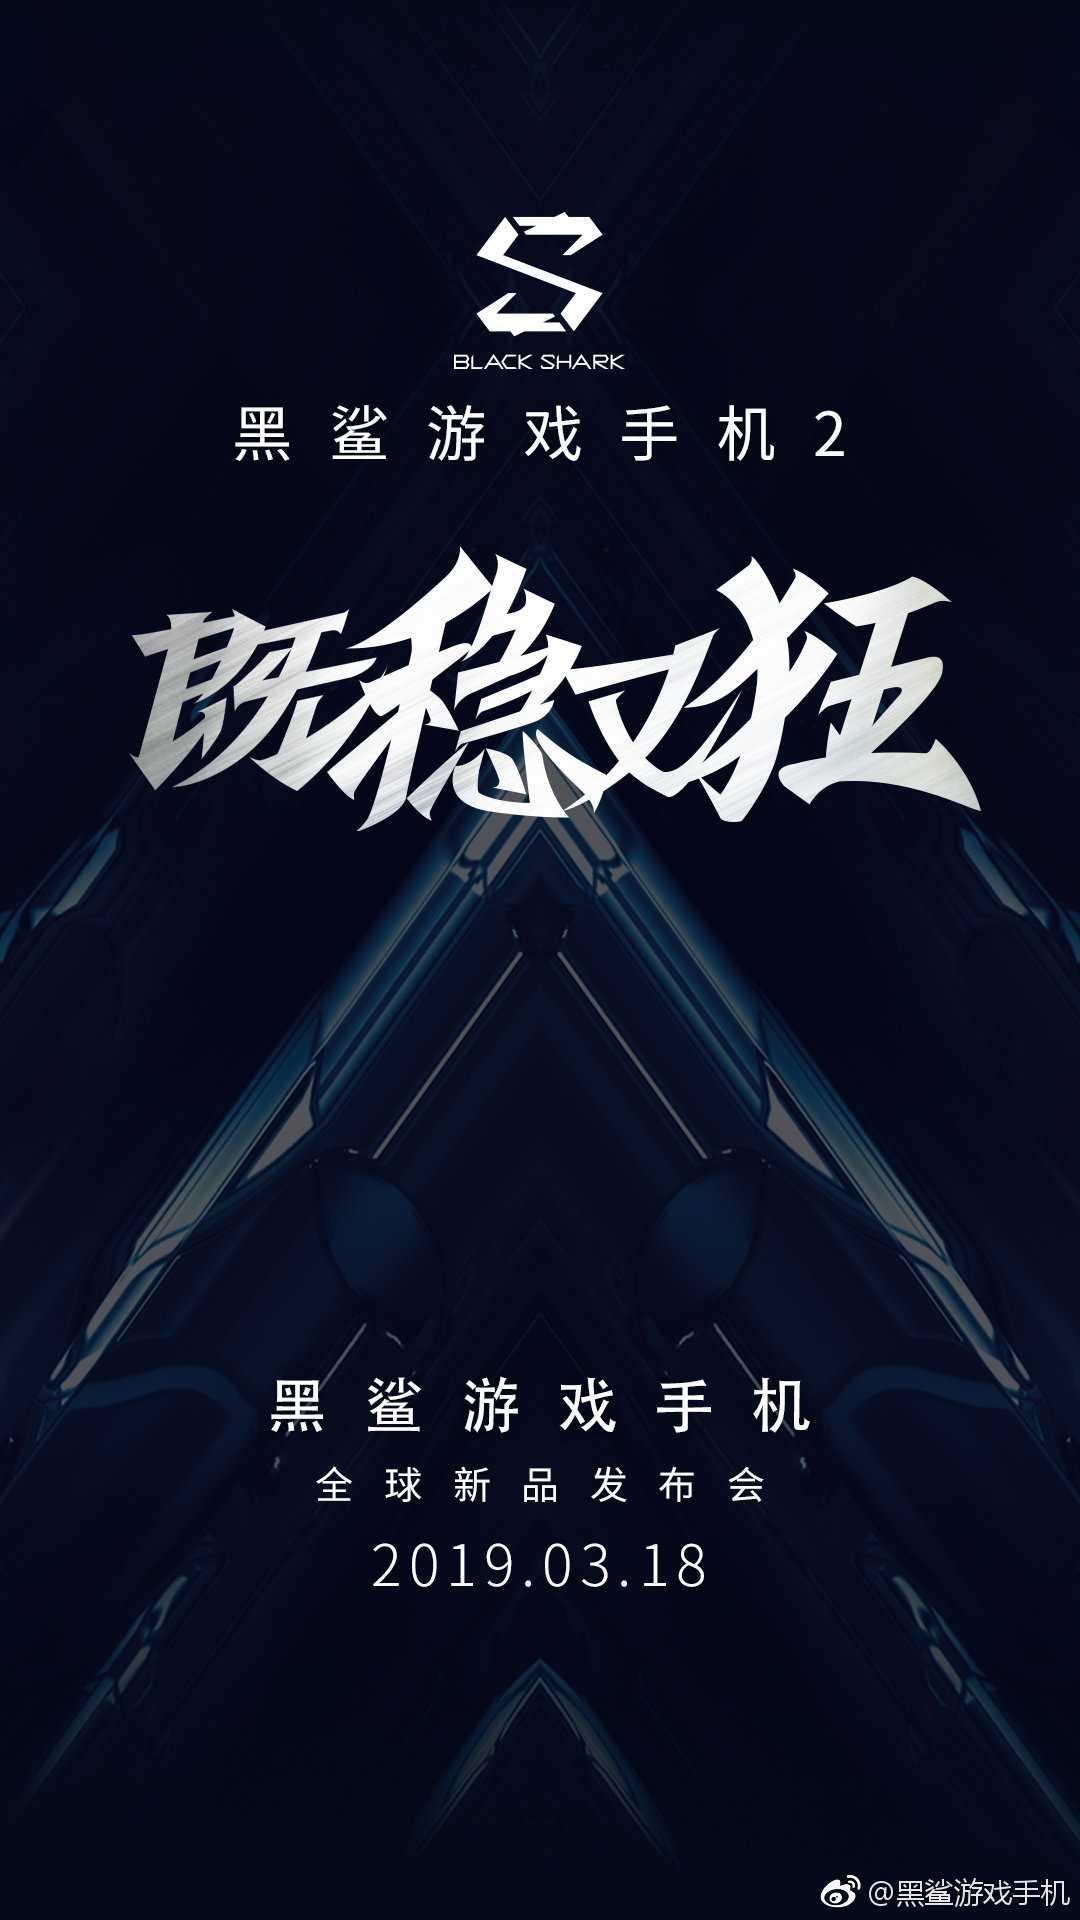 Blaack Shark 2 Launch Poster